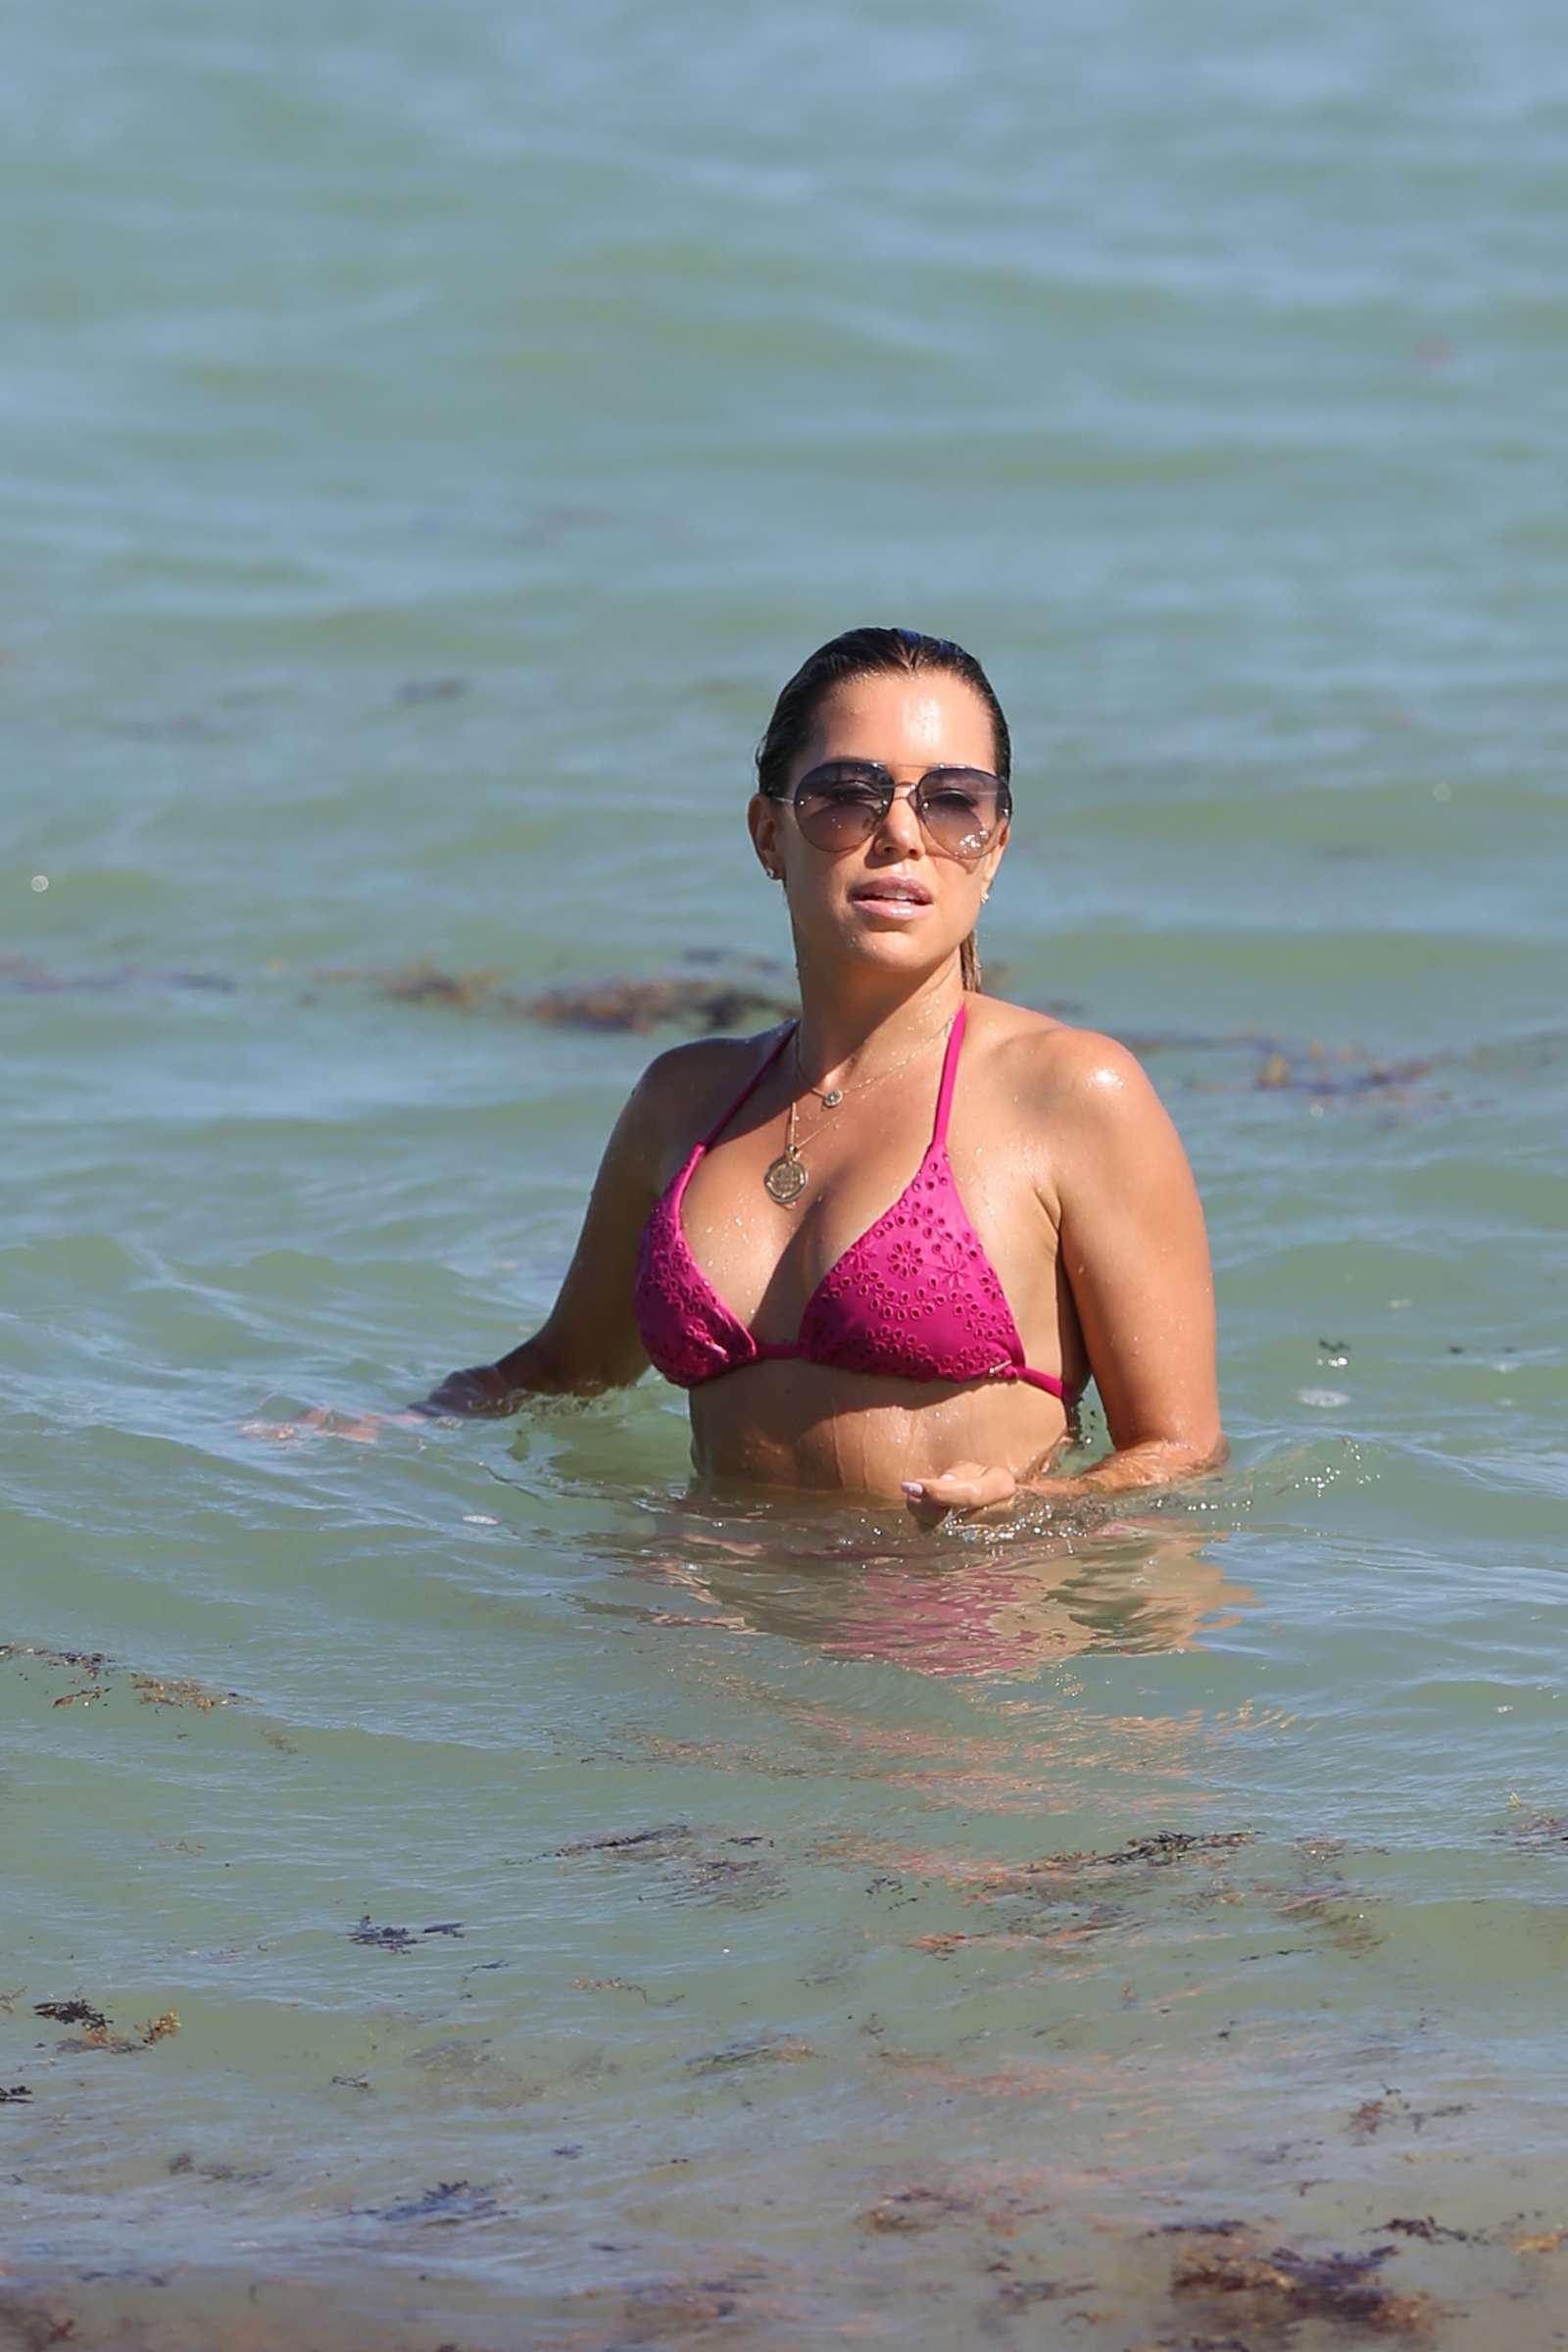 Sylvie Meis 2018 : Sylvie Meis in Pink Bikini 2018 -12